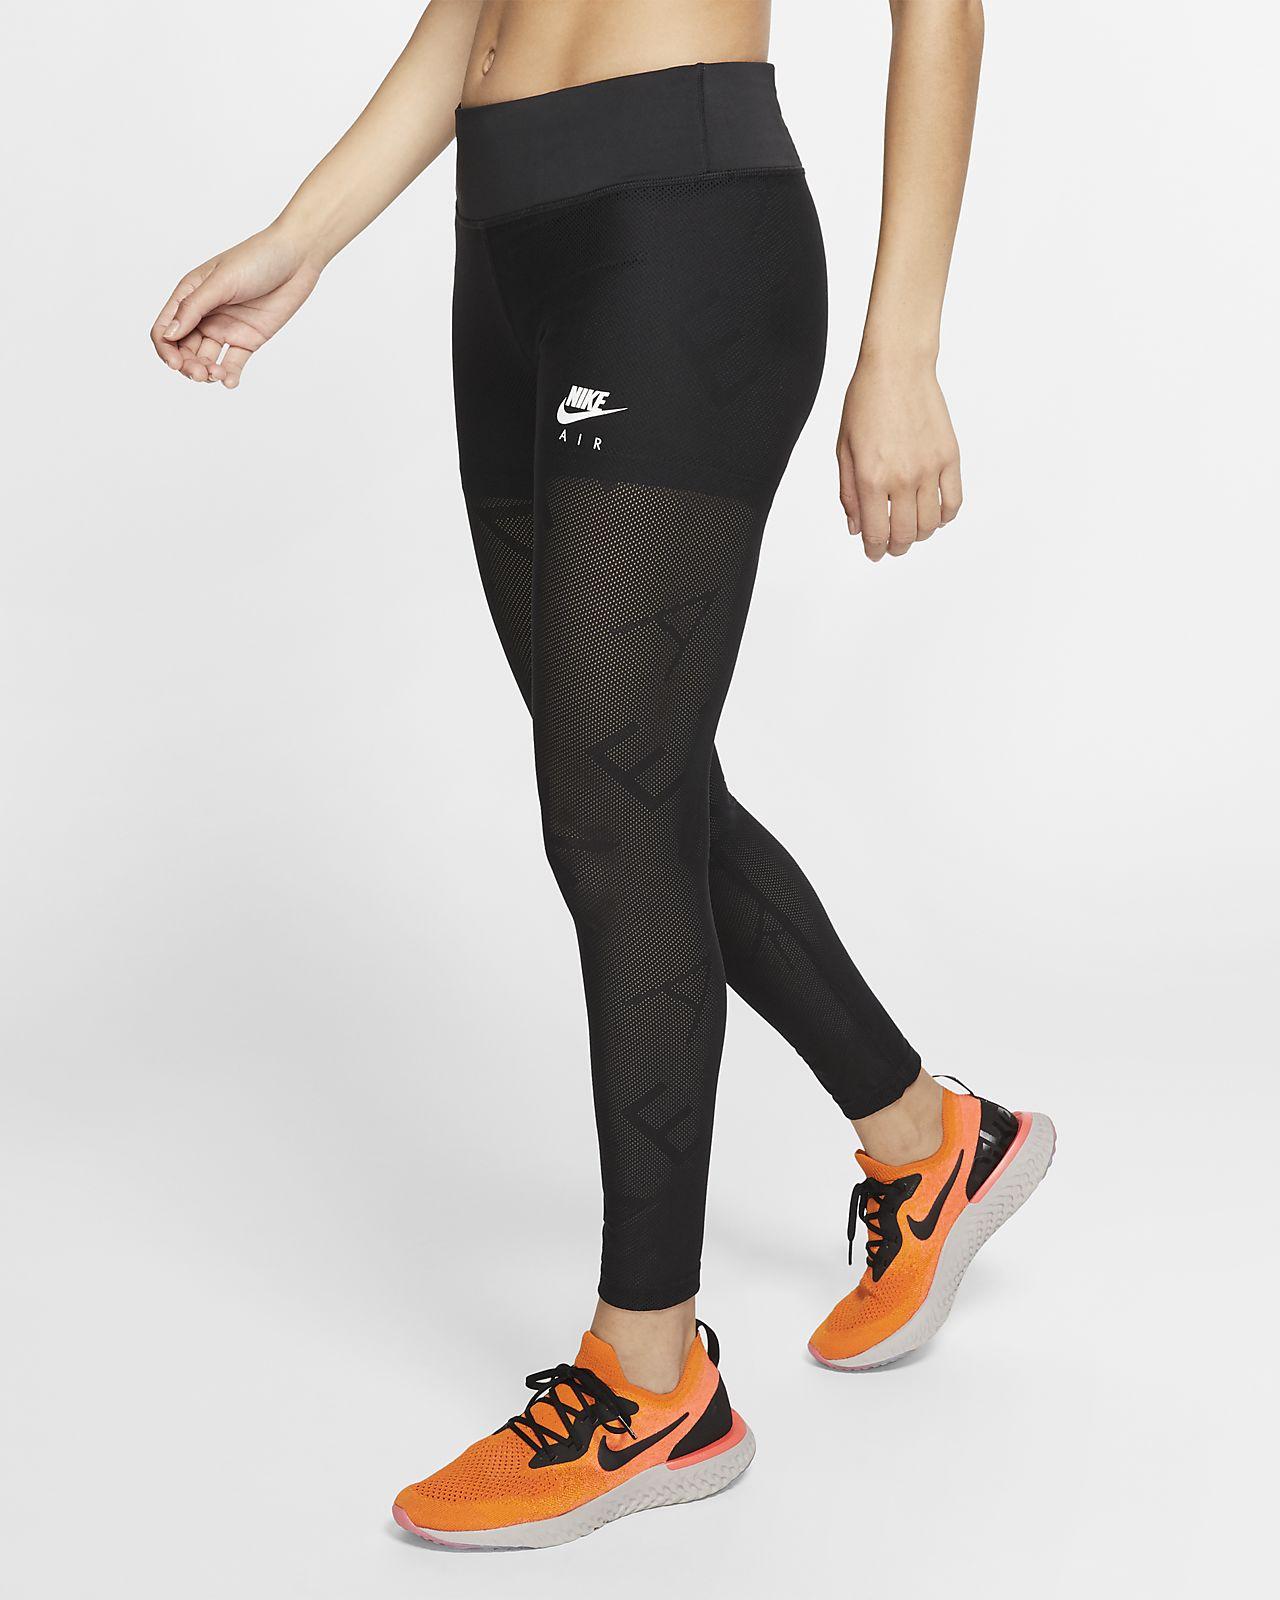 top quality pretty cool wholesale dealer Nike Air 7/8-Lauf-Tights aus Mesh für Damen